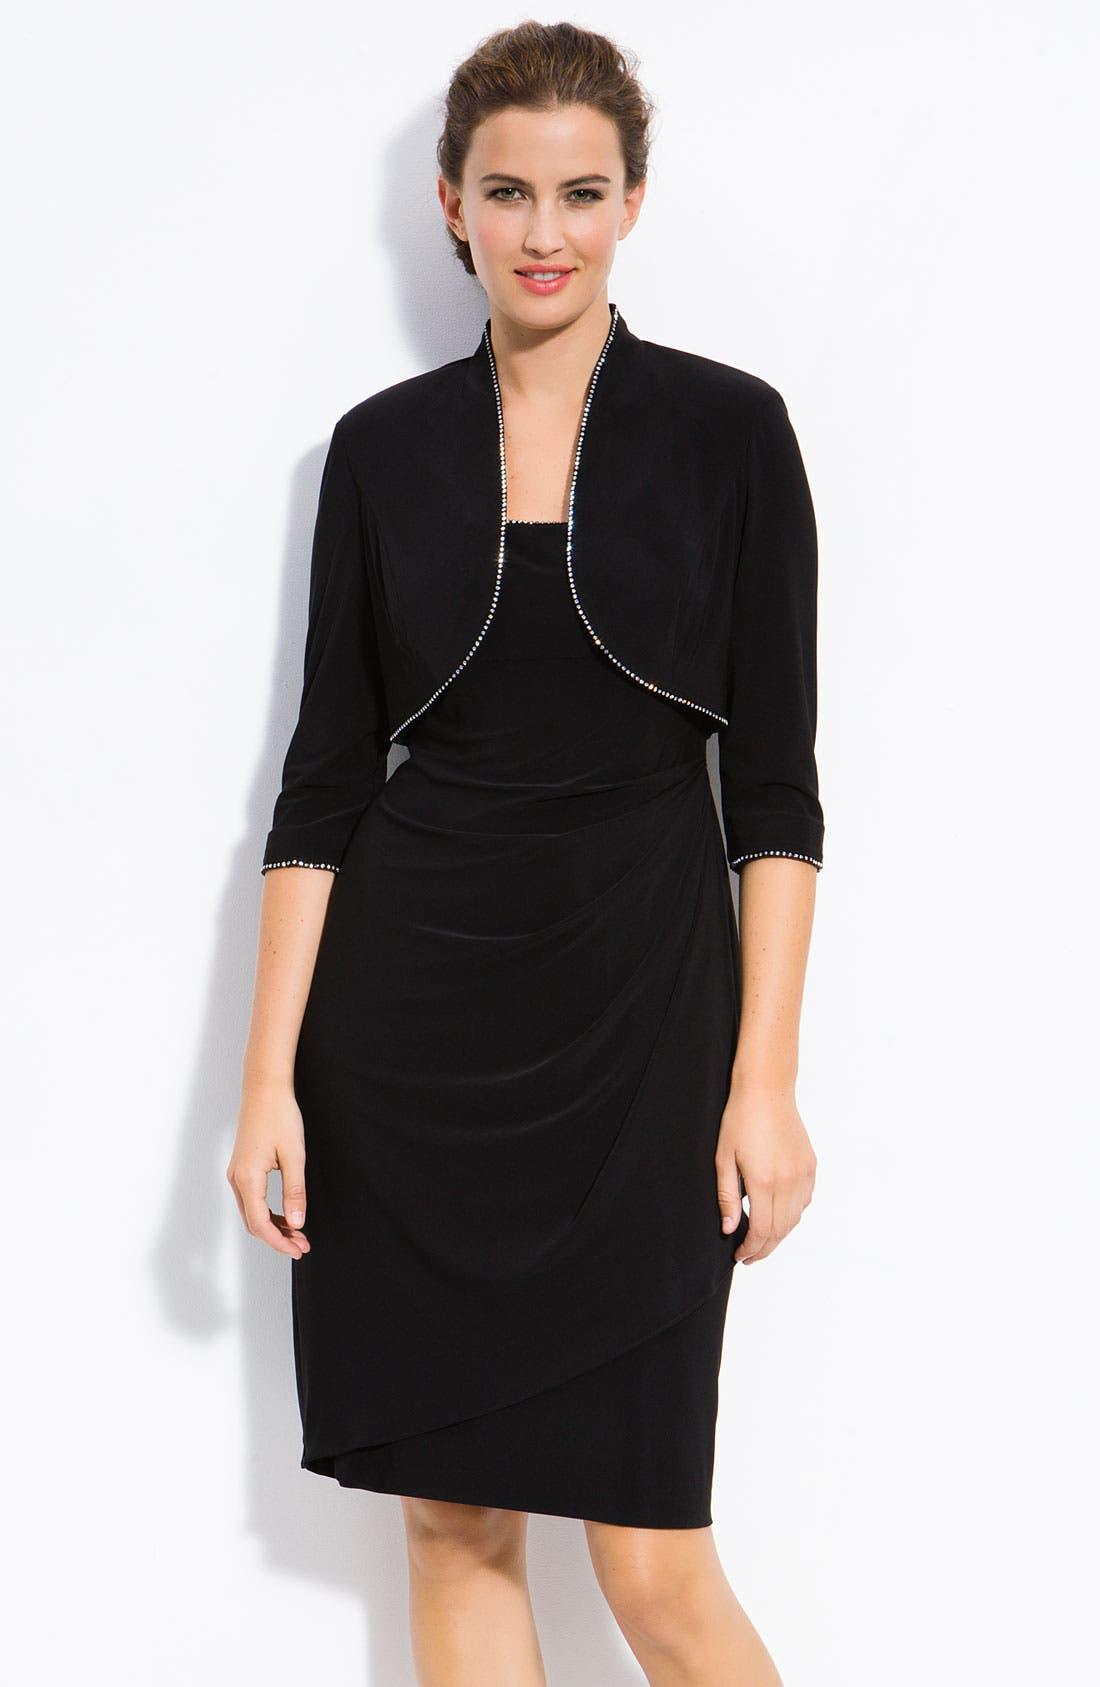 Alternate Image 1 Selected - Alex Evenings Rhinestone Trim Dress & Jacket (Petite)